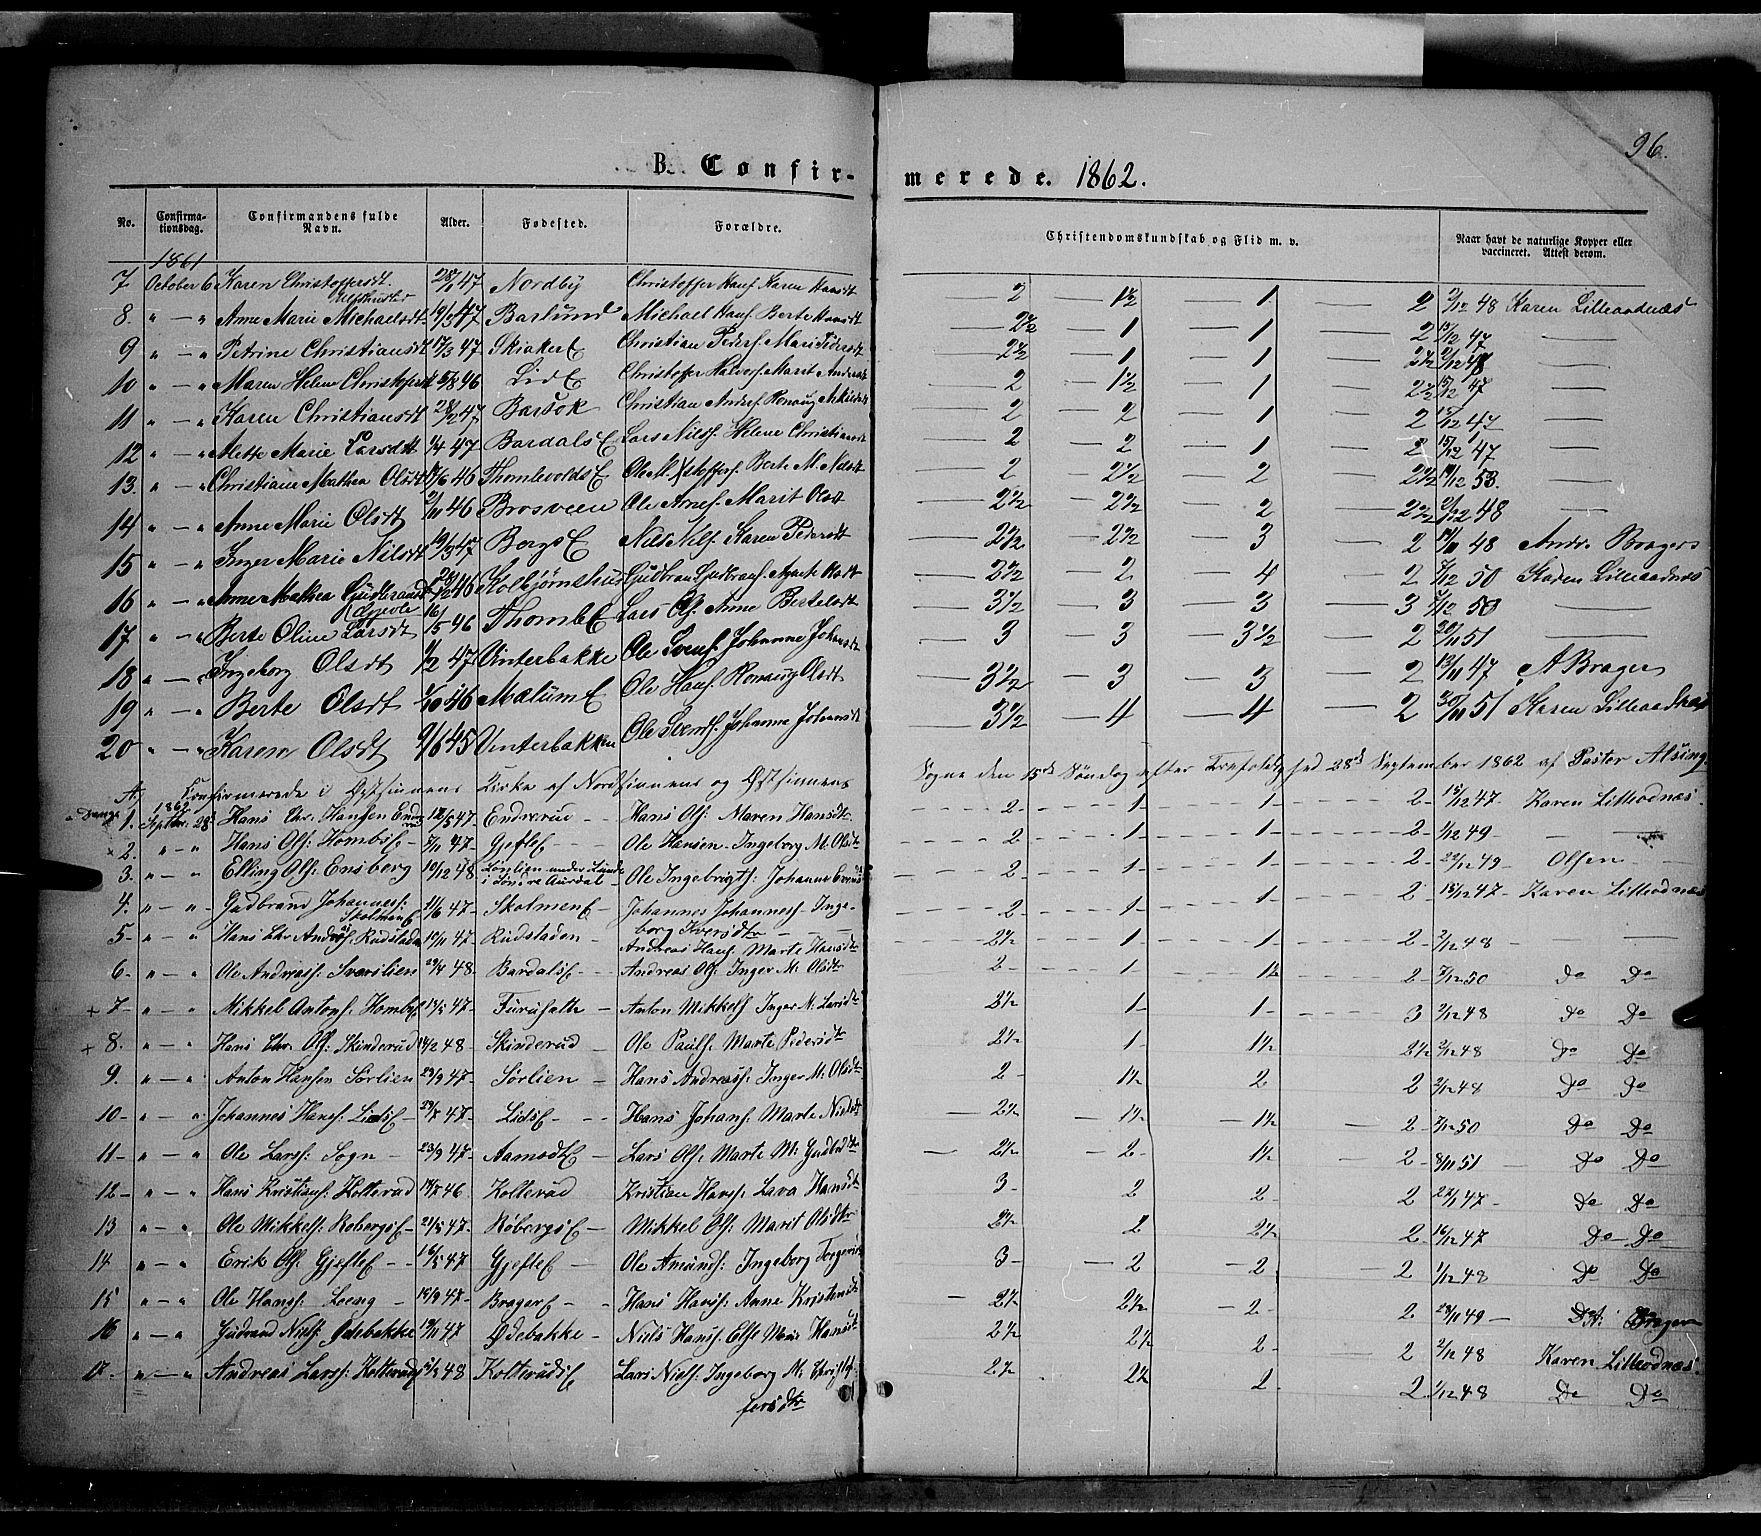 SAH, Nordre Land prestekontor, Ministerialbok nr. 1, 1860-1871, s. 96